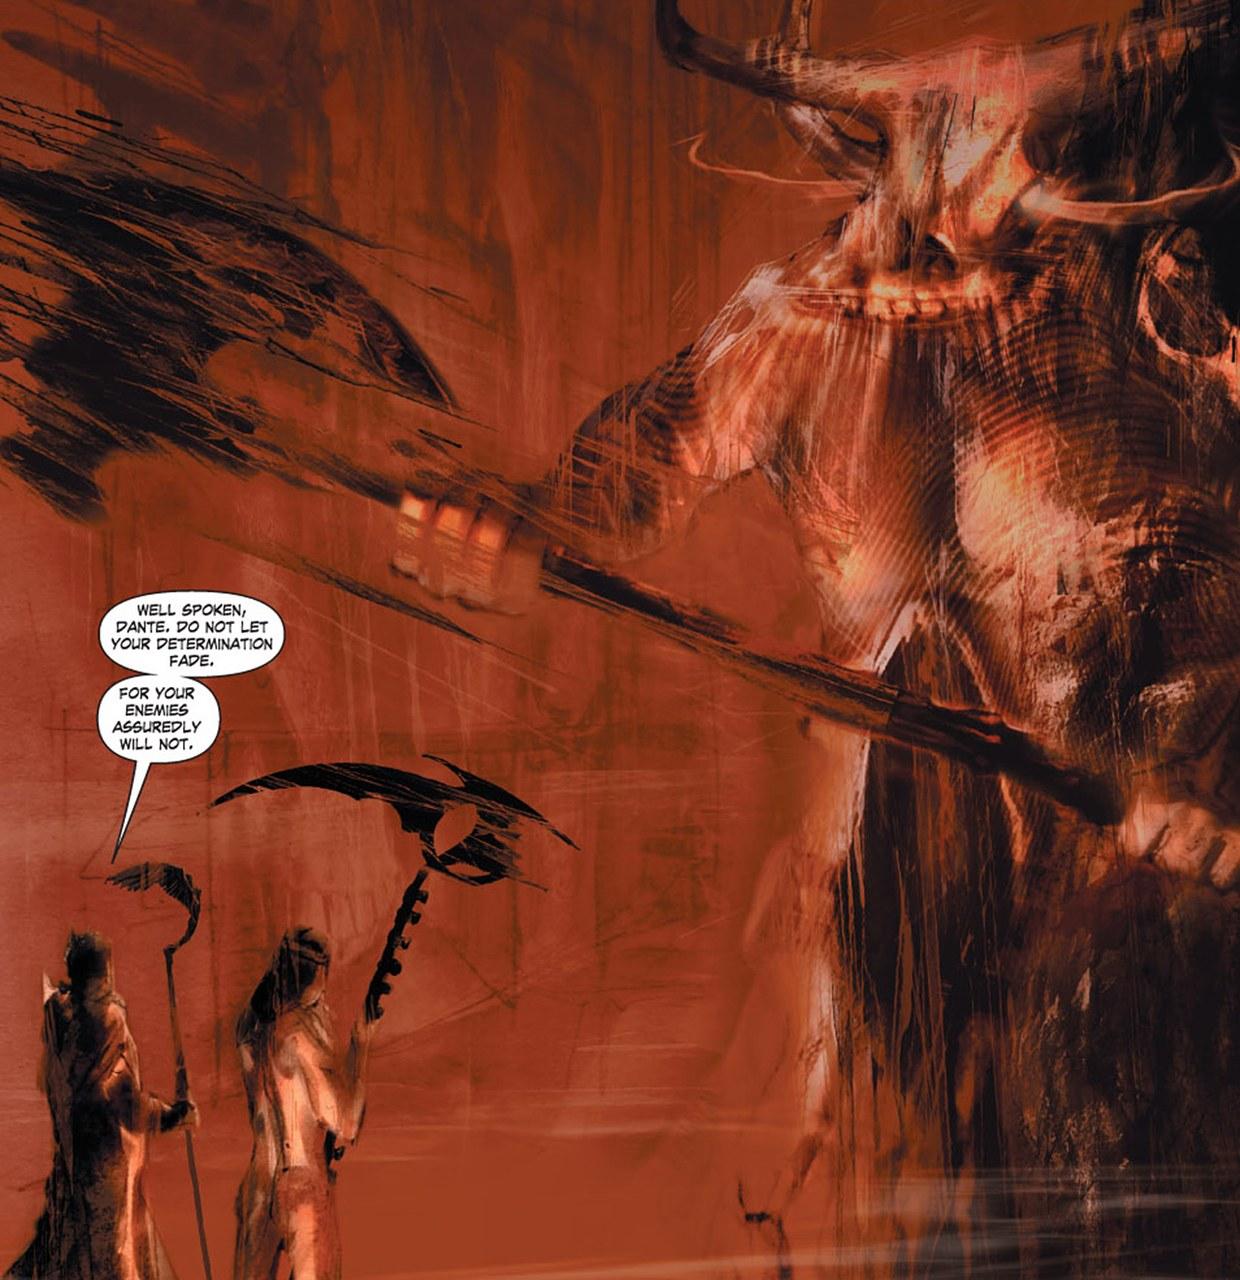 Christos Gage,Diego Latorre,Dante affronta il Minotauro, 2010, tav. 81